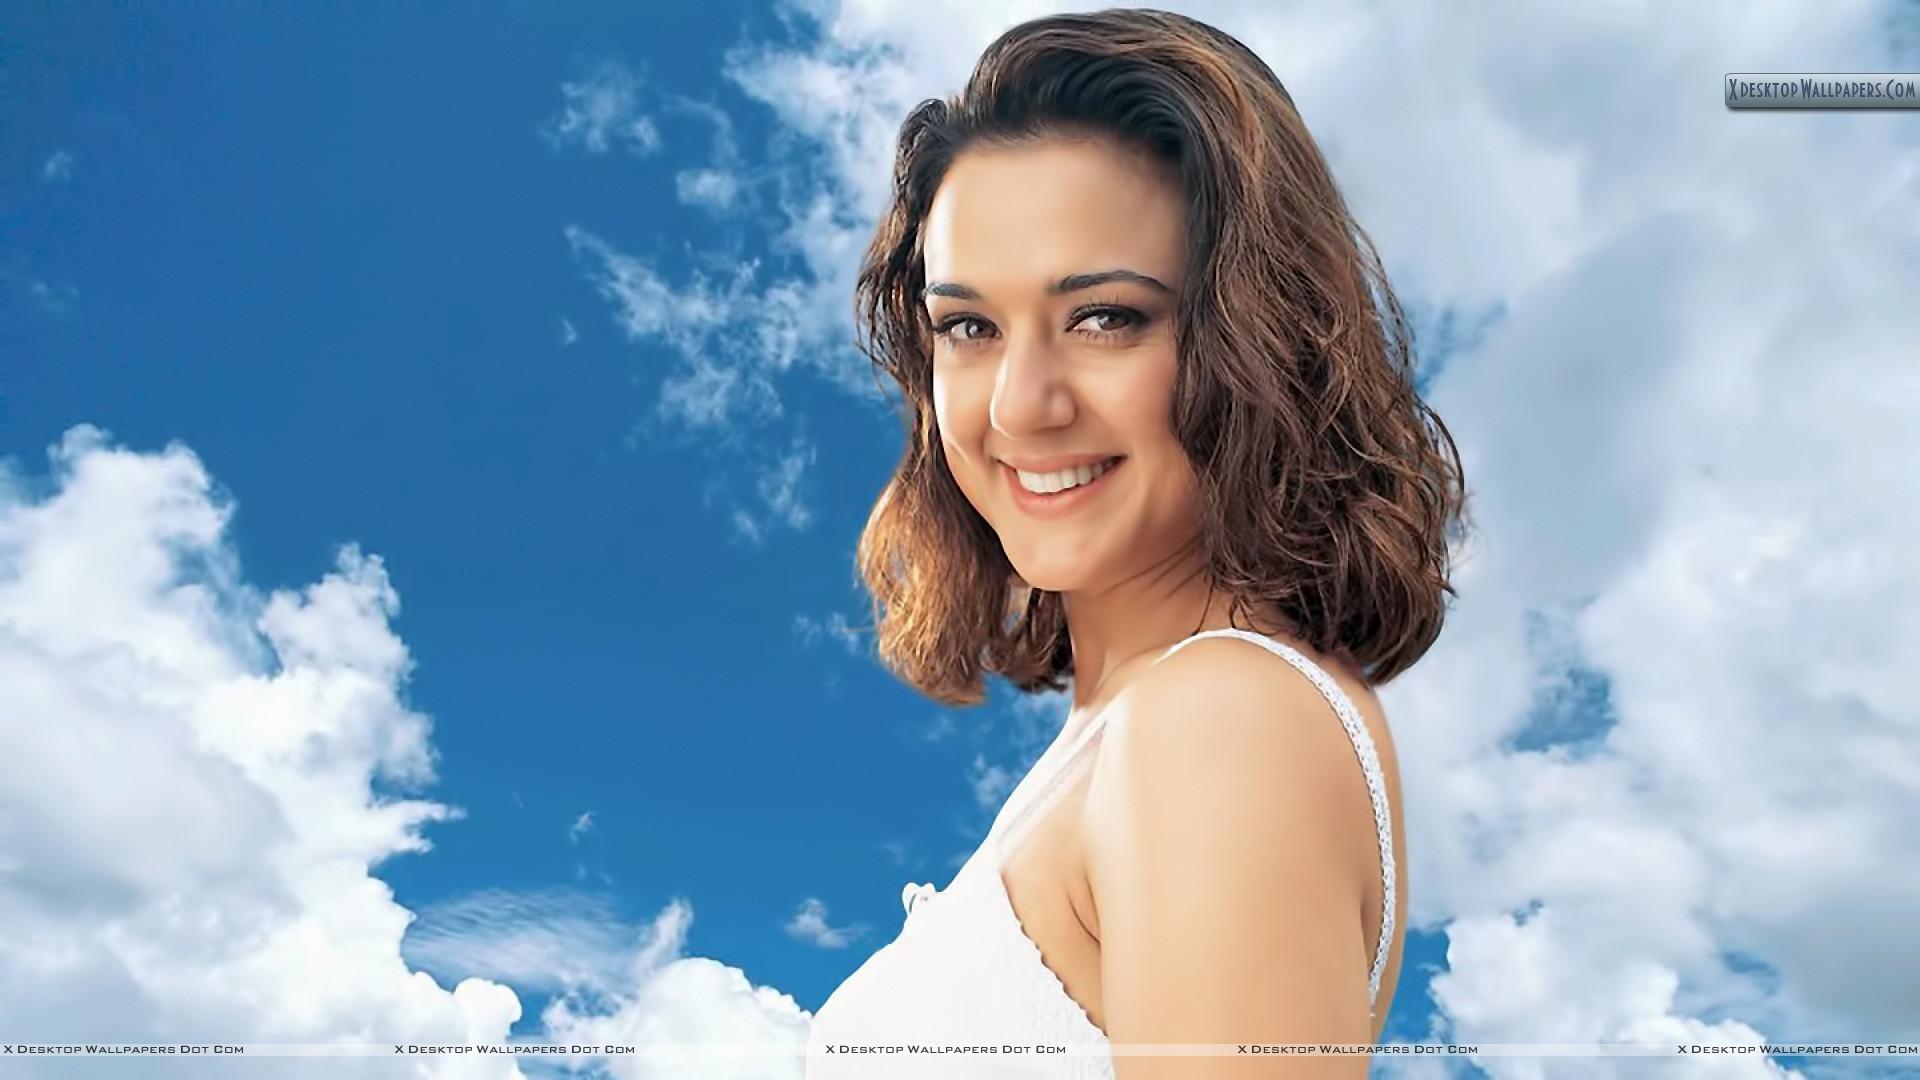 Olhares de cabelo inspirados curtos de celebridades de Bollywood